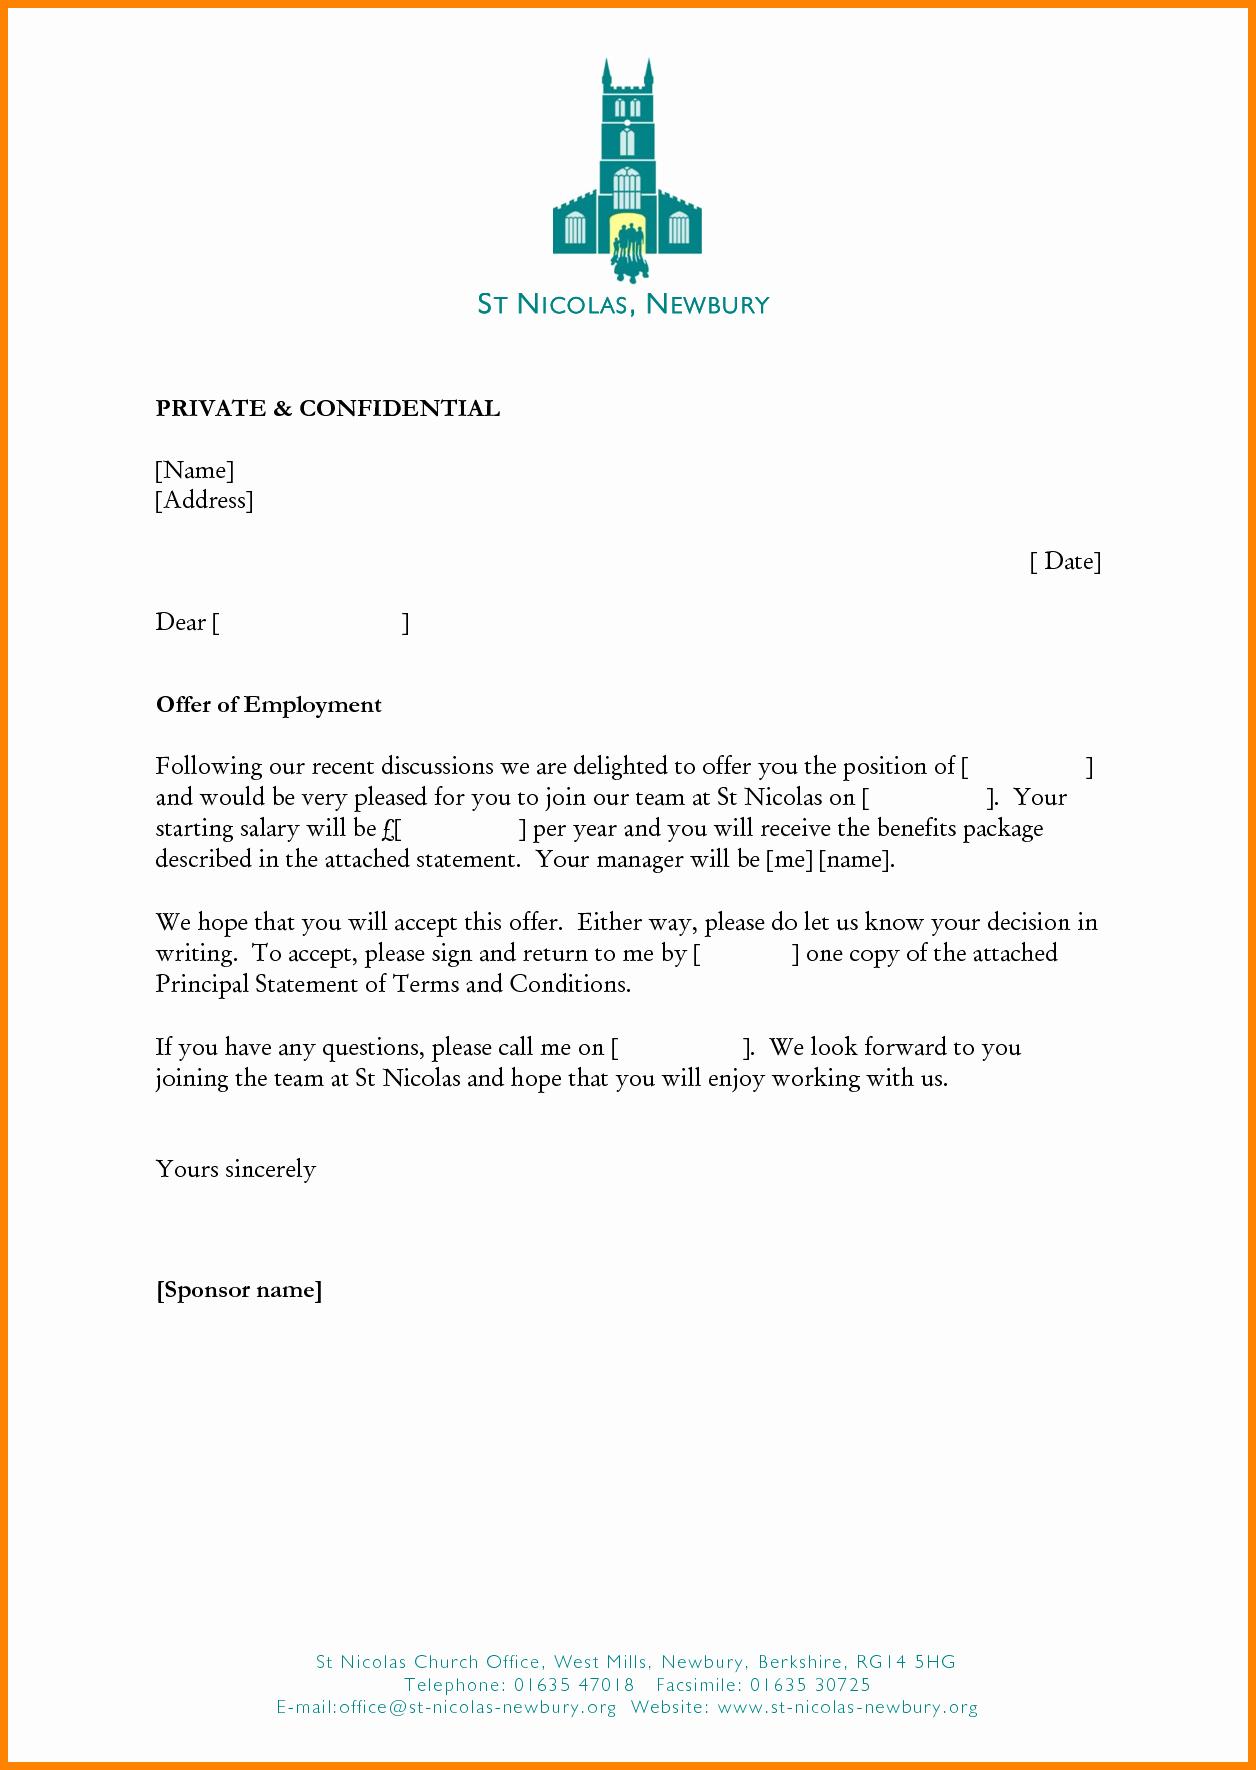 5 Job Offer Letter Templates